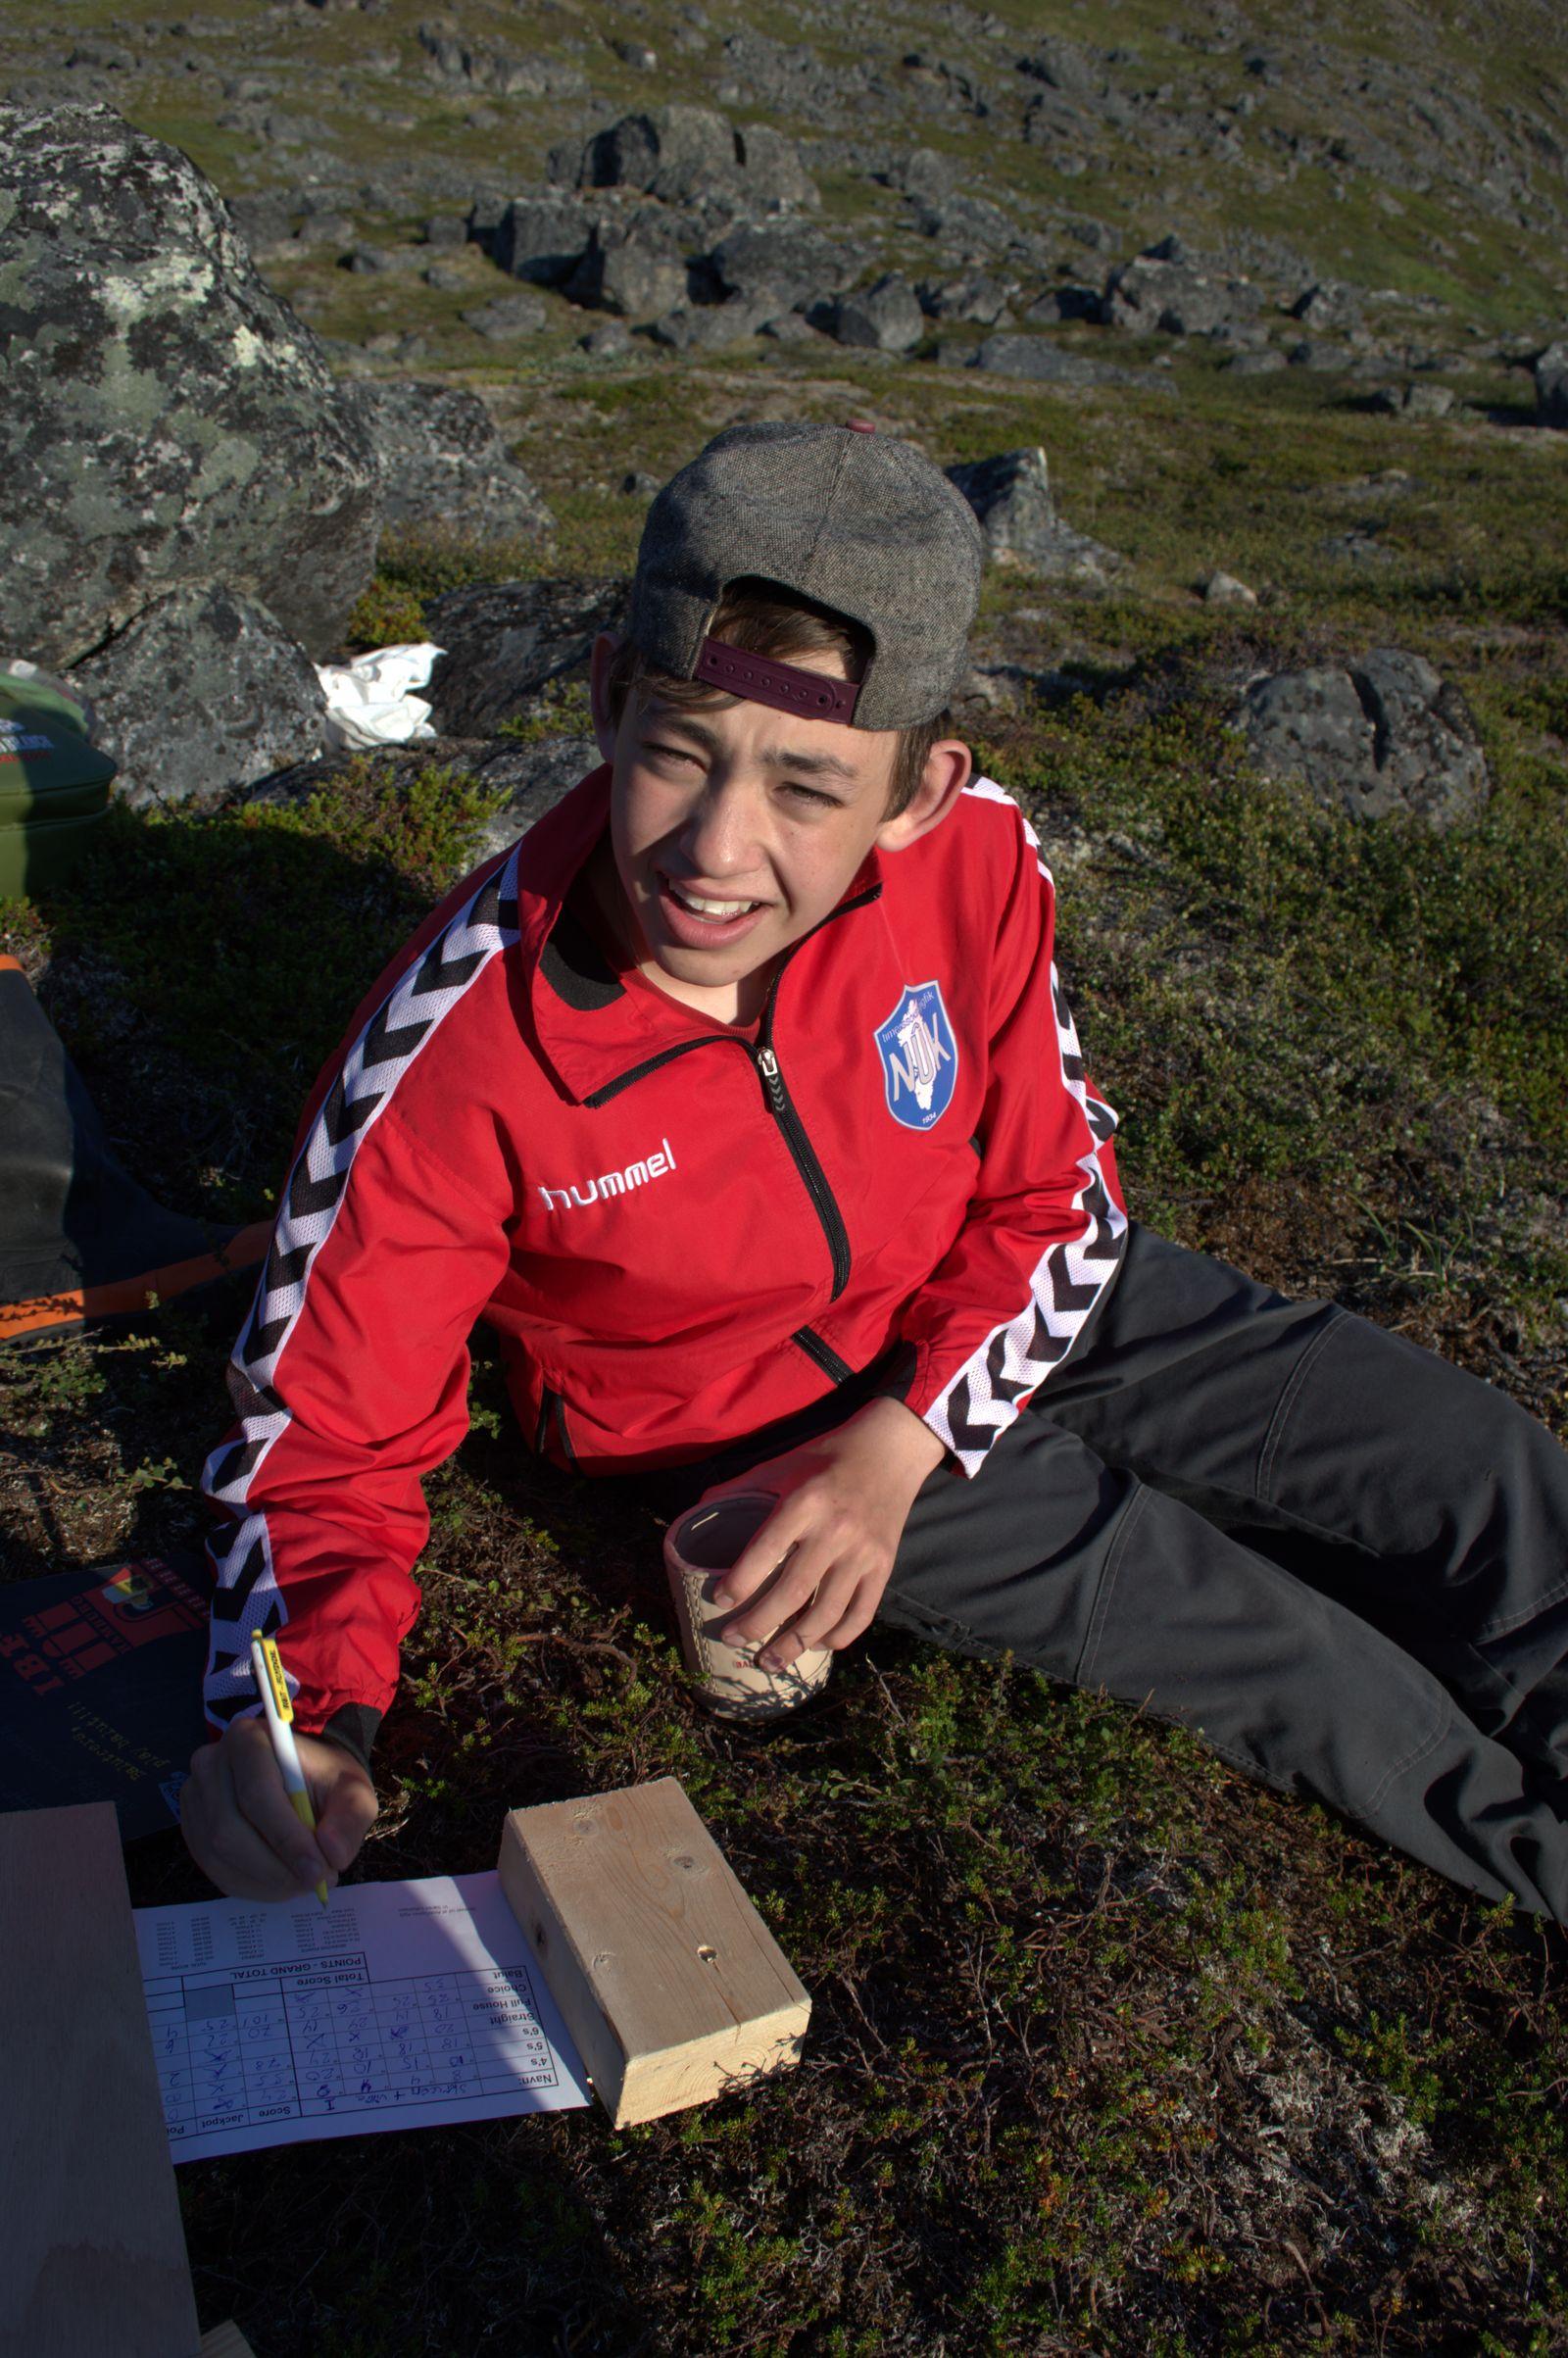 2014-07-24-2020_-_Anders-Martinsen_3